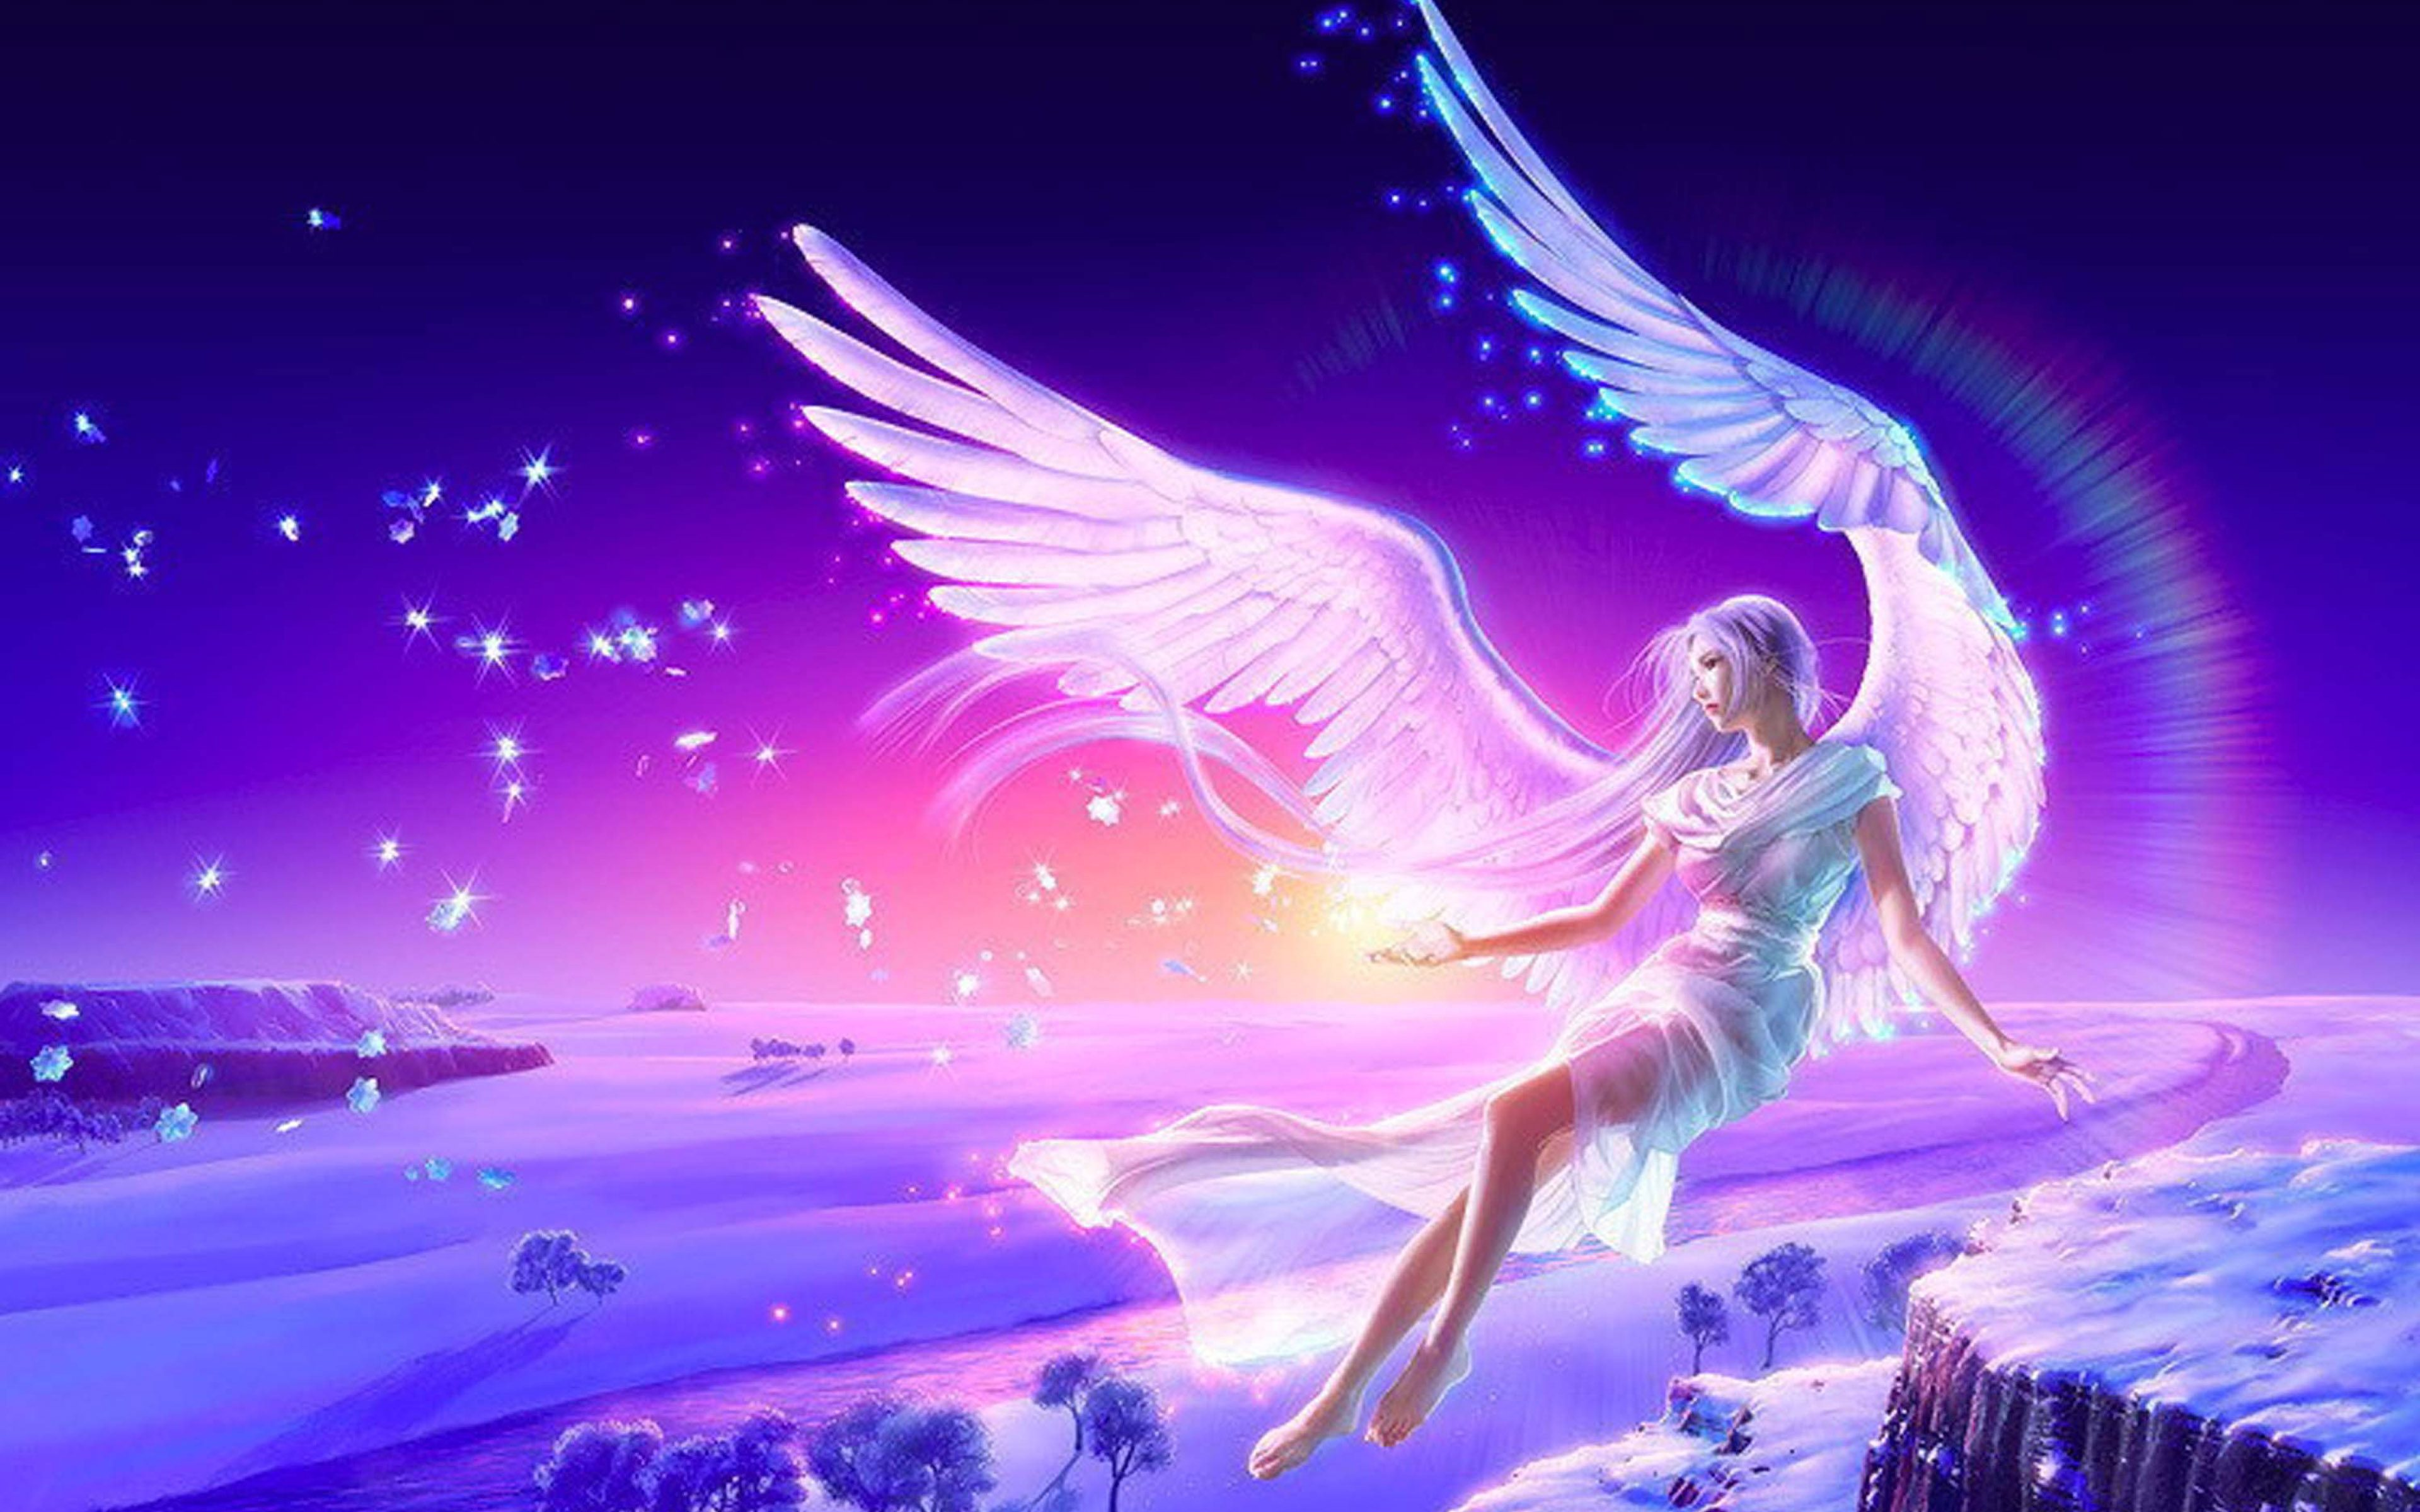 Girl Anime Blue Pink Wings 4K Wallpaper - Best Wallpapers